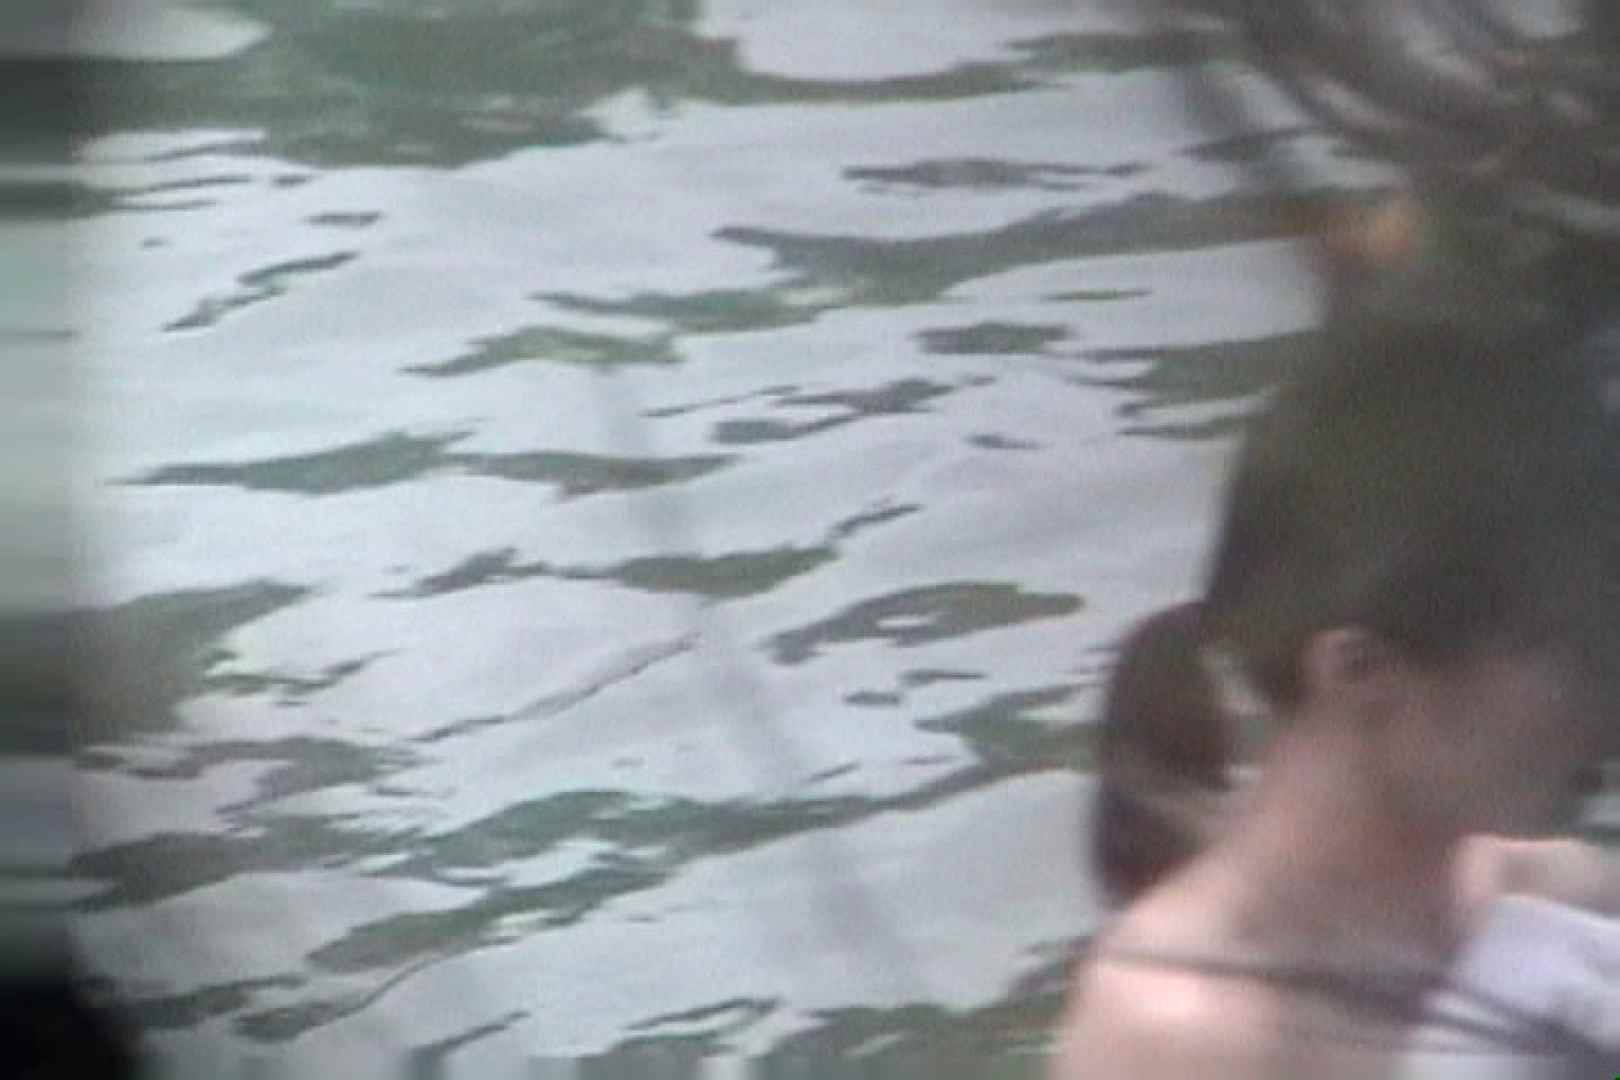 Aquaな露天風呂Vol.71【VIP限定】 綺麗なOLたち | 盗撮  66枚 40